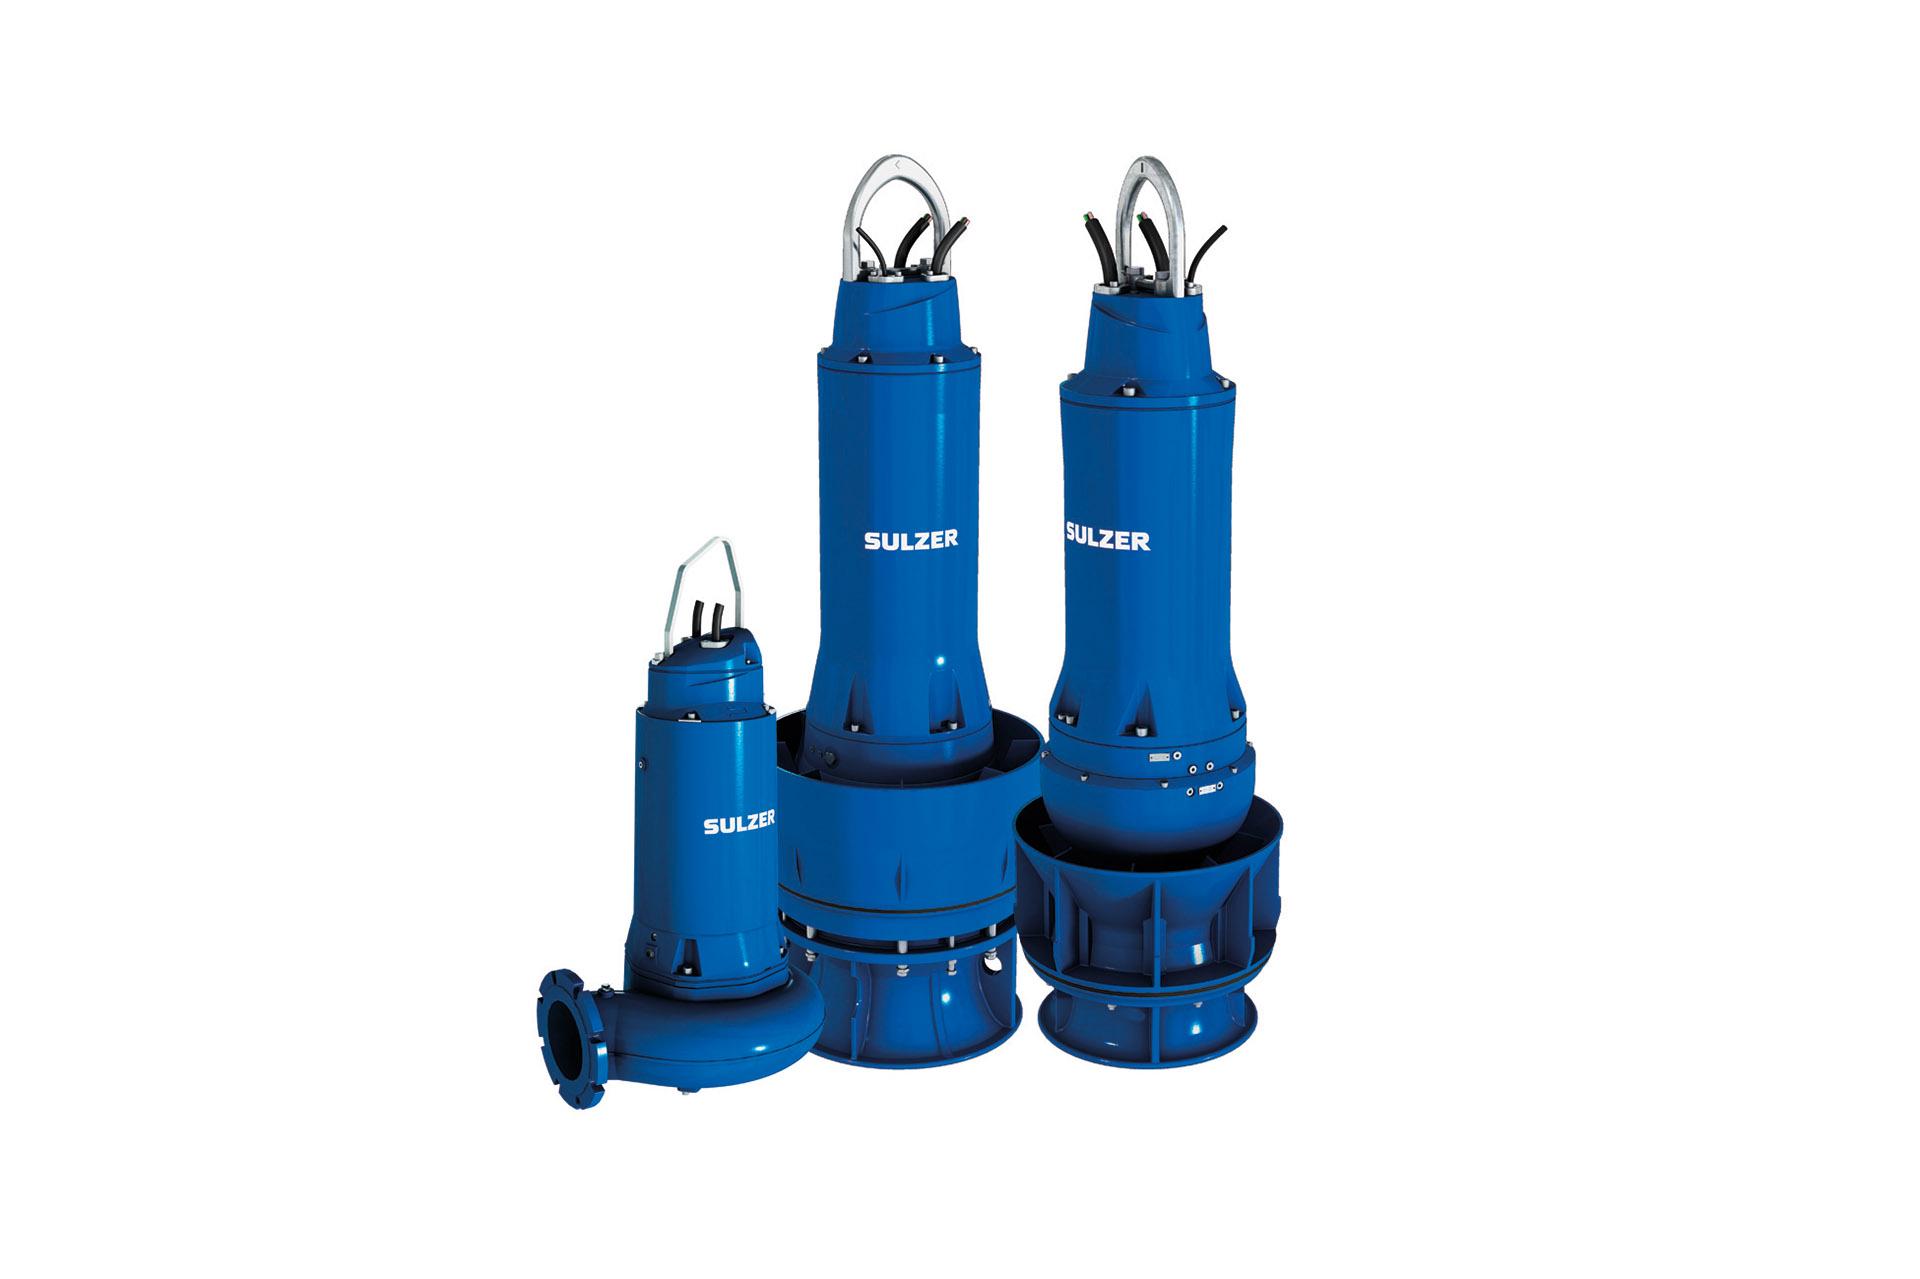 Submersible Pumps Sulzer Esp Ltd M50 Wiring Diagram